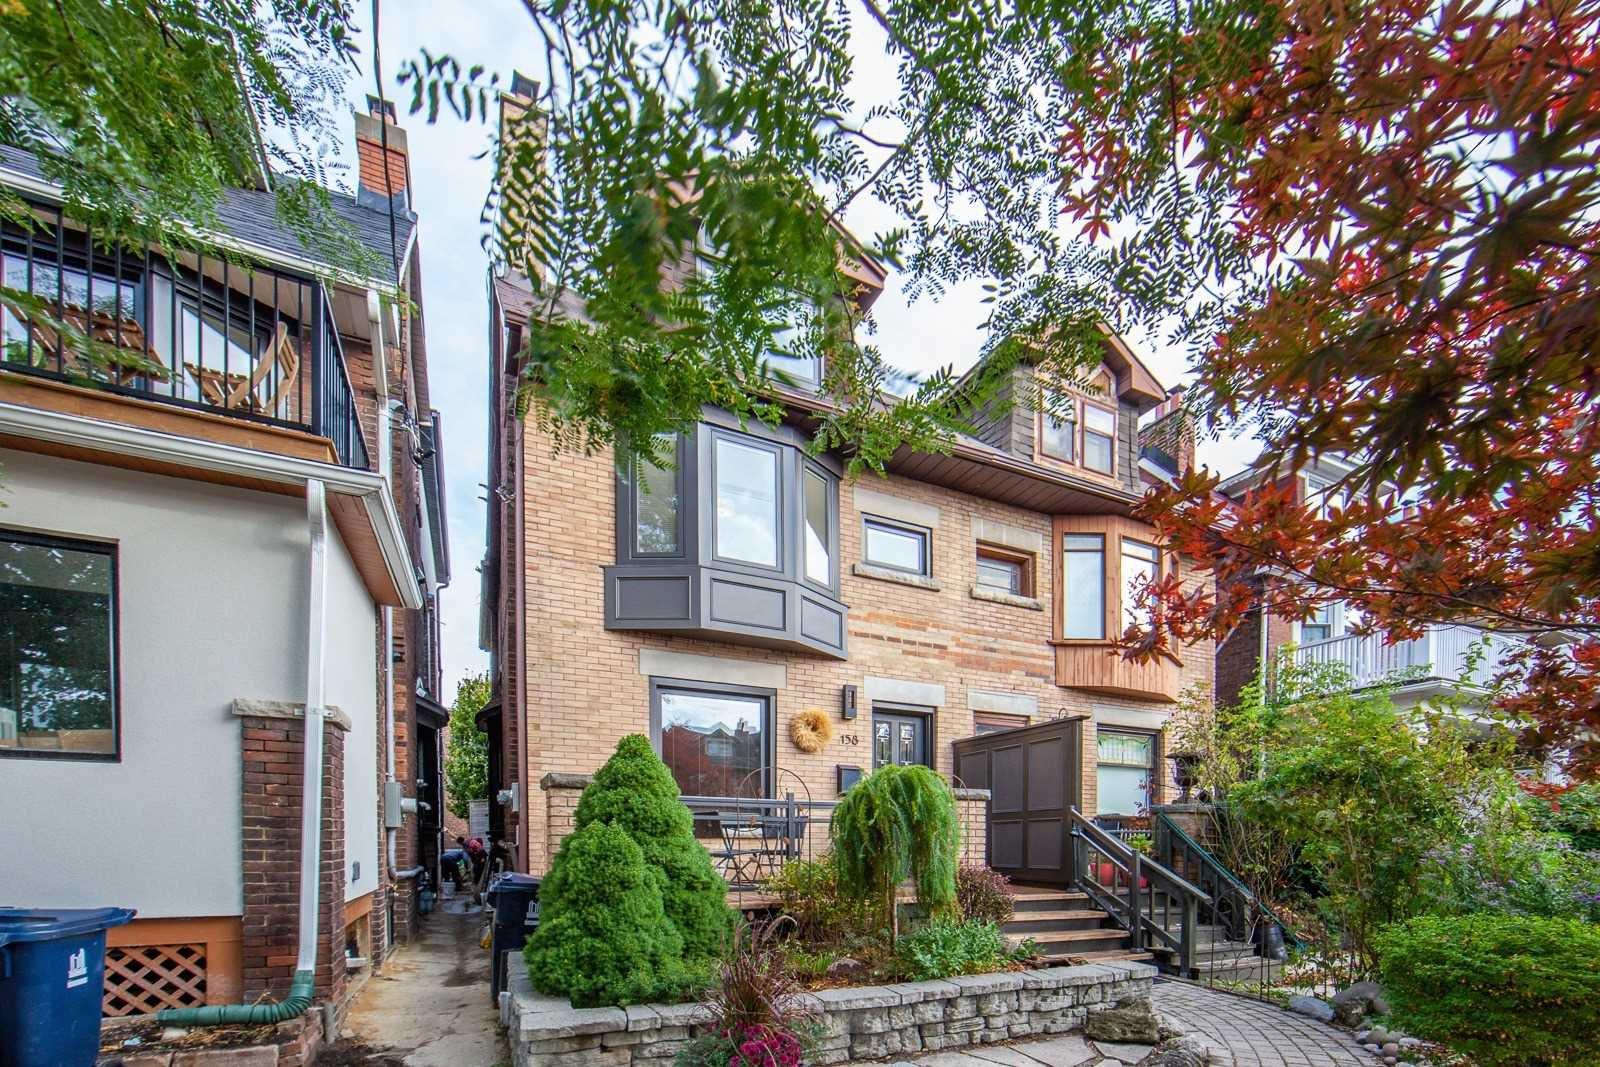 Main Photo: 158 Fulton Avenue in Toronto: Playter Estates-Danforth House (2 1/2 Storey) for sale (Toronto E03)  : MLS®# E4934821